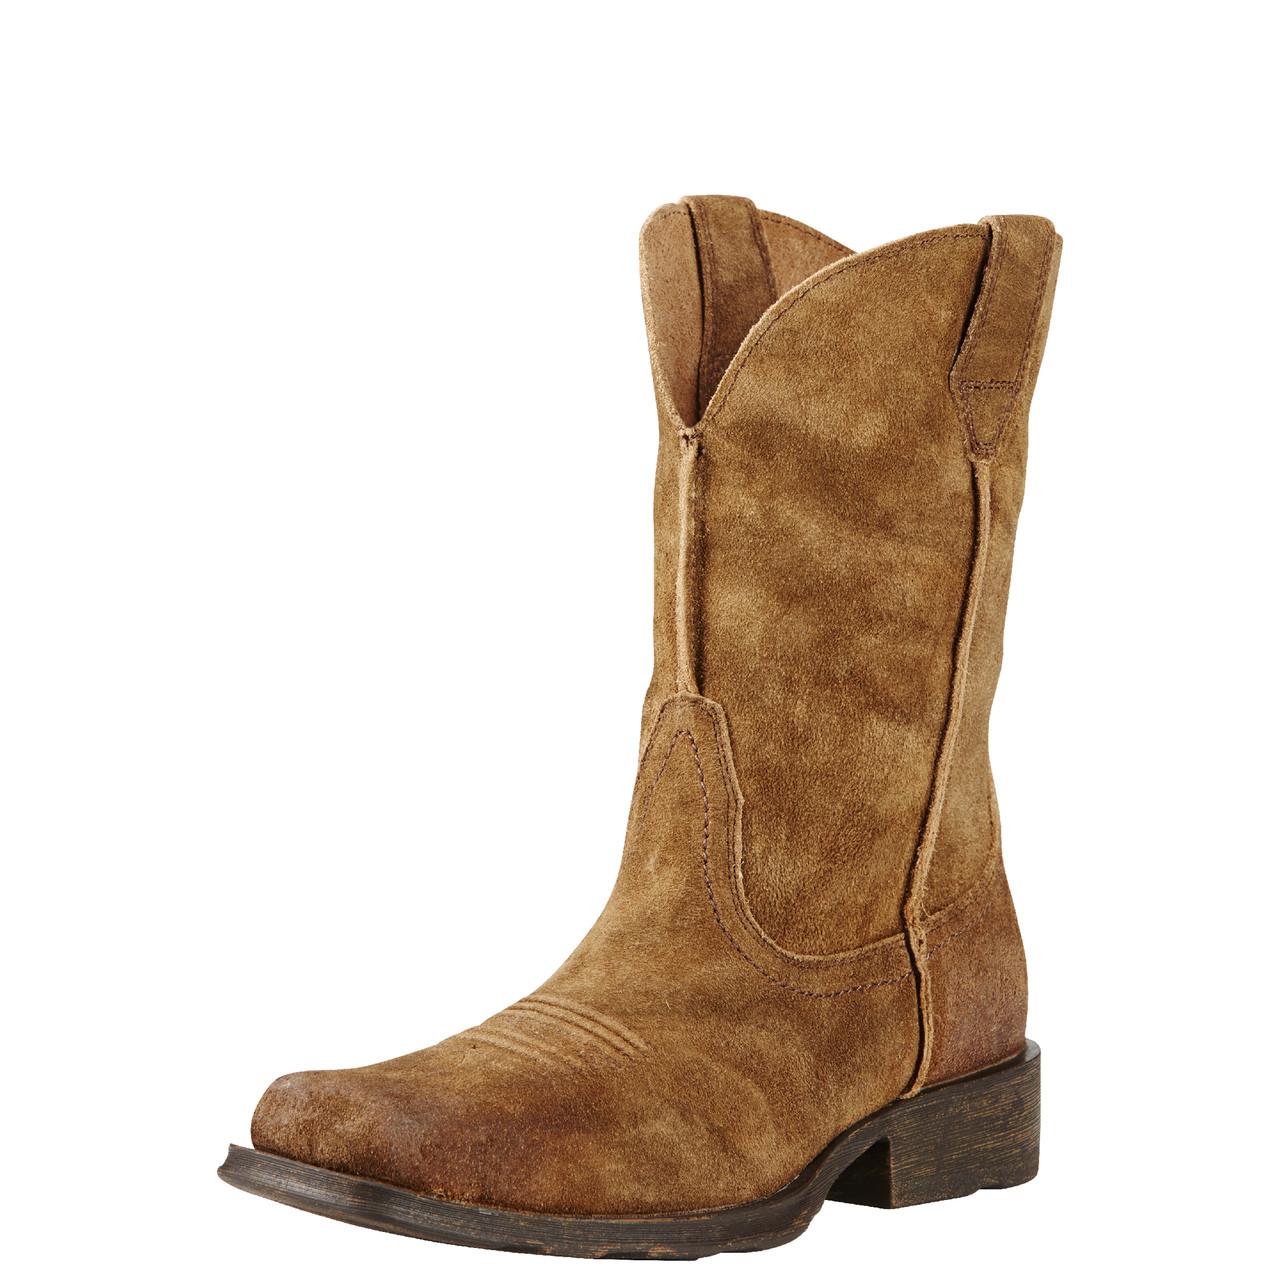 c9b5ac23415 Ariat Men's Urban Rambler Cowboy Boot - Antique Mocha Suede